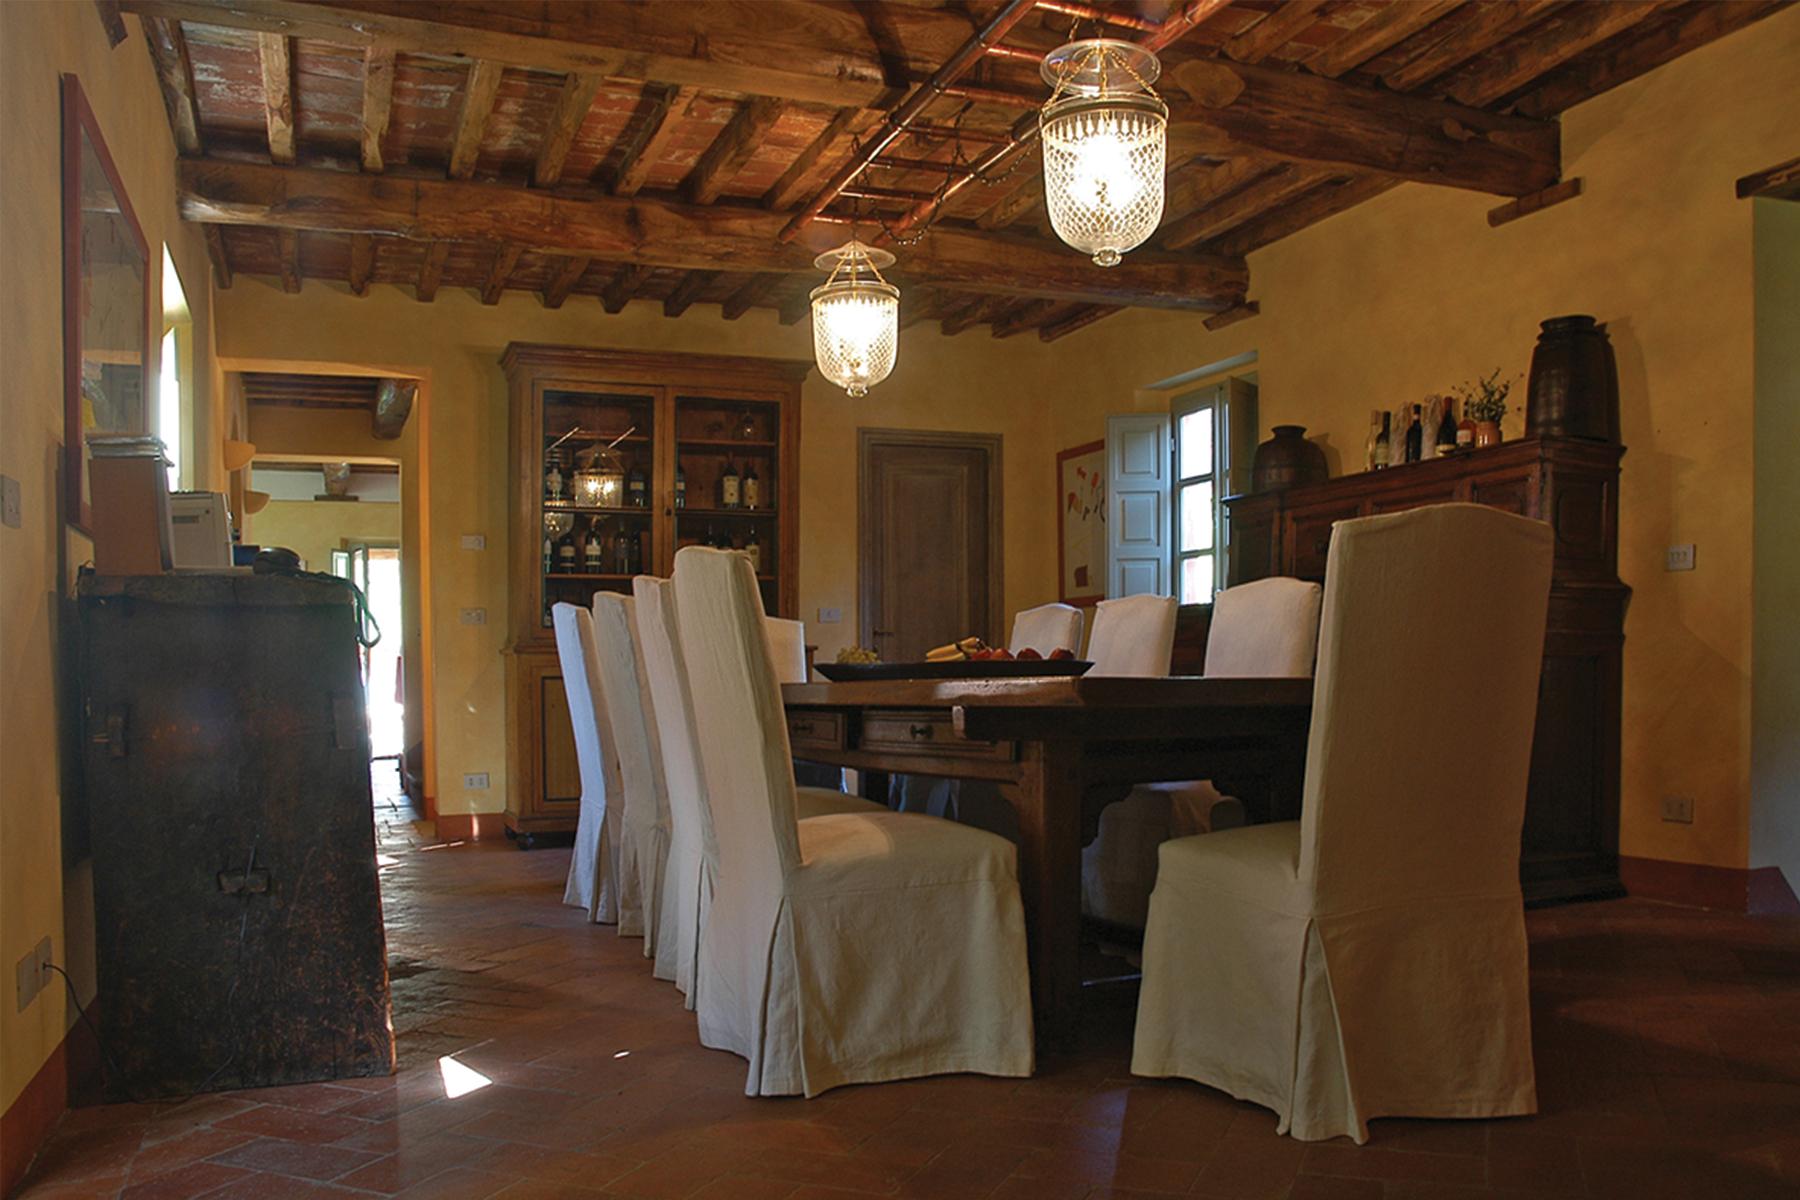 Casa indipendente in Vendita a Massarosa: 5 locali, 350 mq - Foto 8